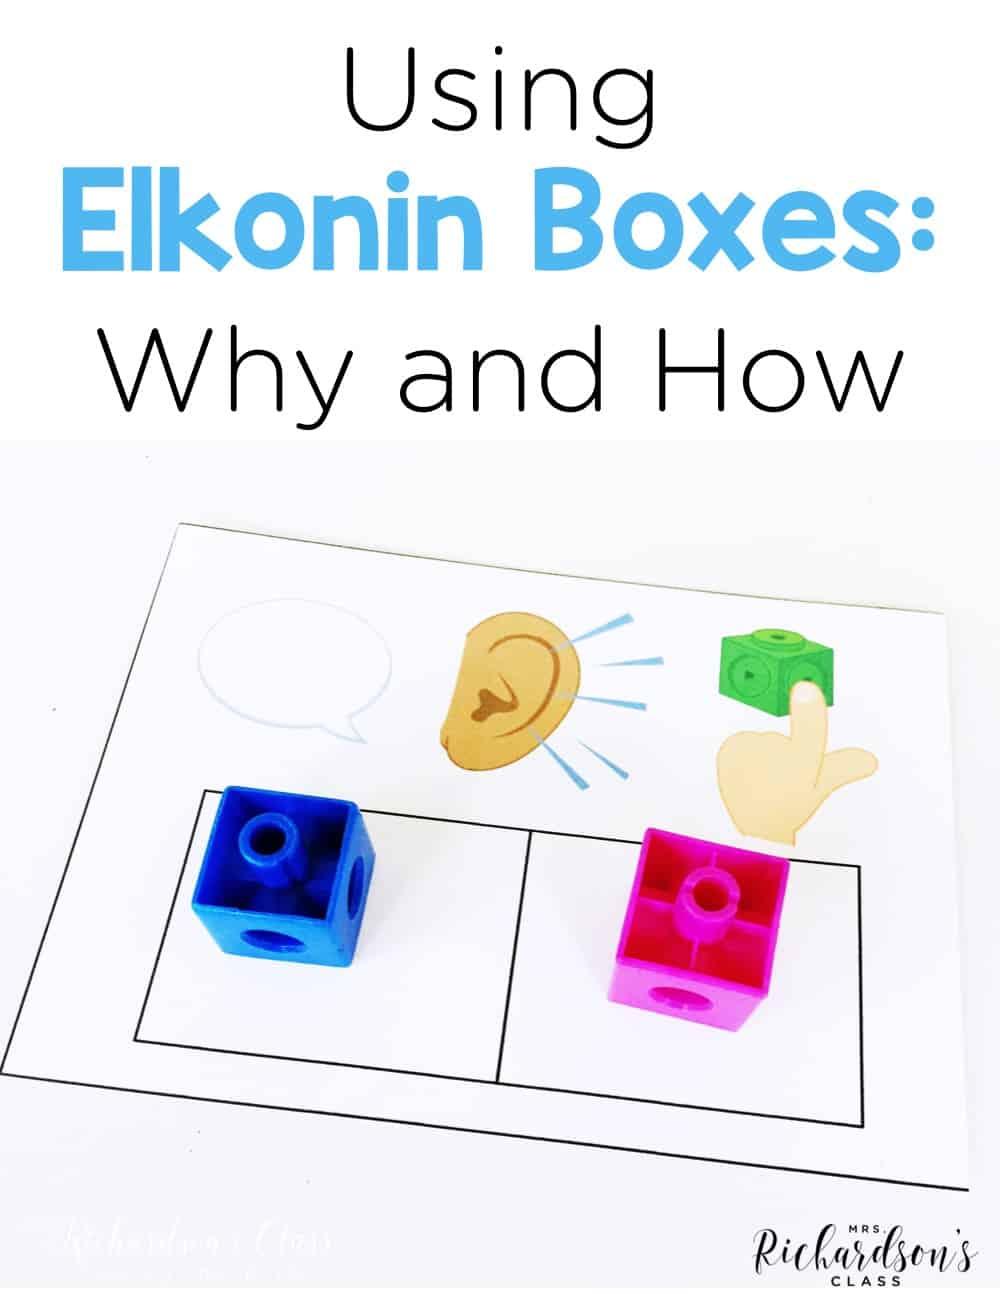 picture regarding Elkonin Boxes Printable called Utilizing Elkonin Bins - Mrs. Richardsons Cl